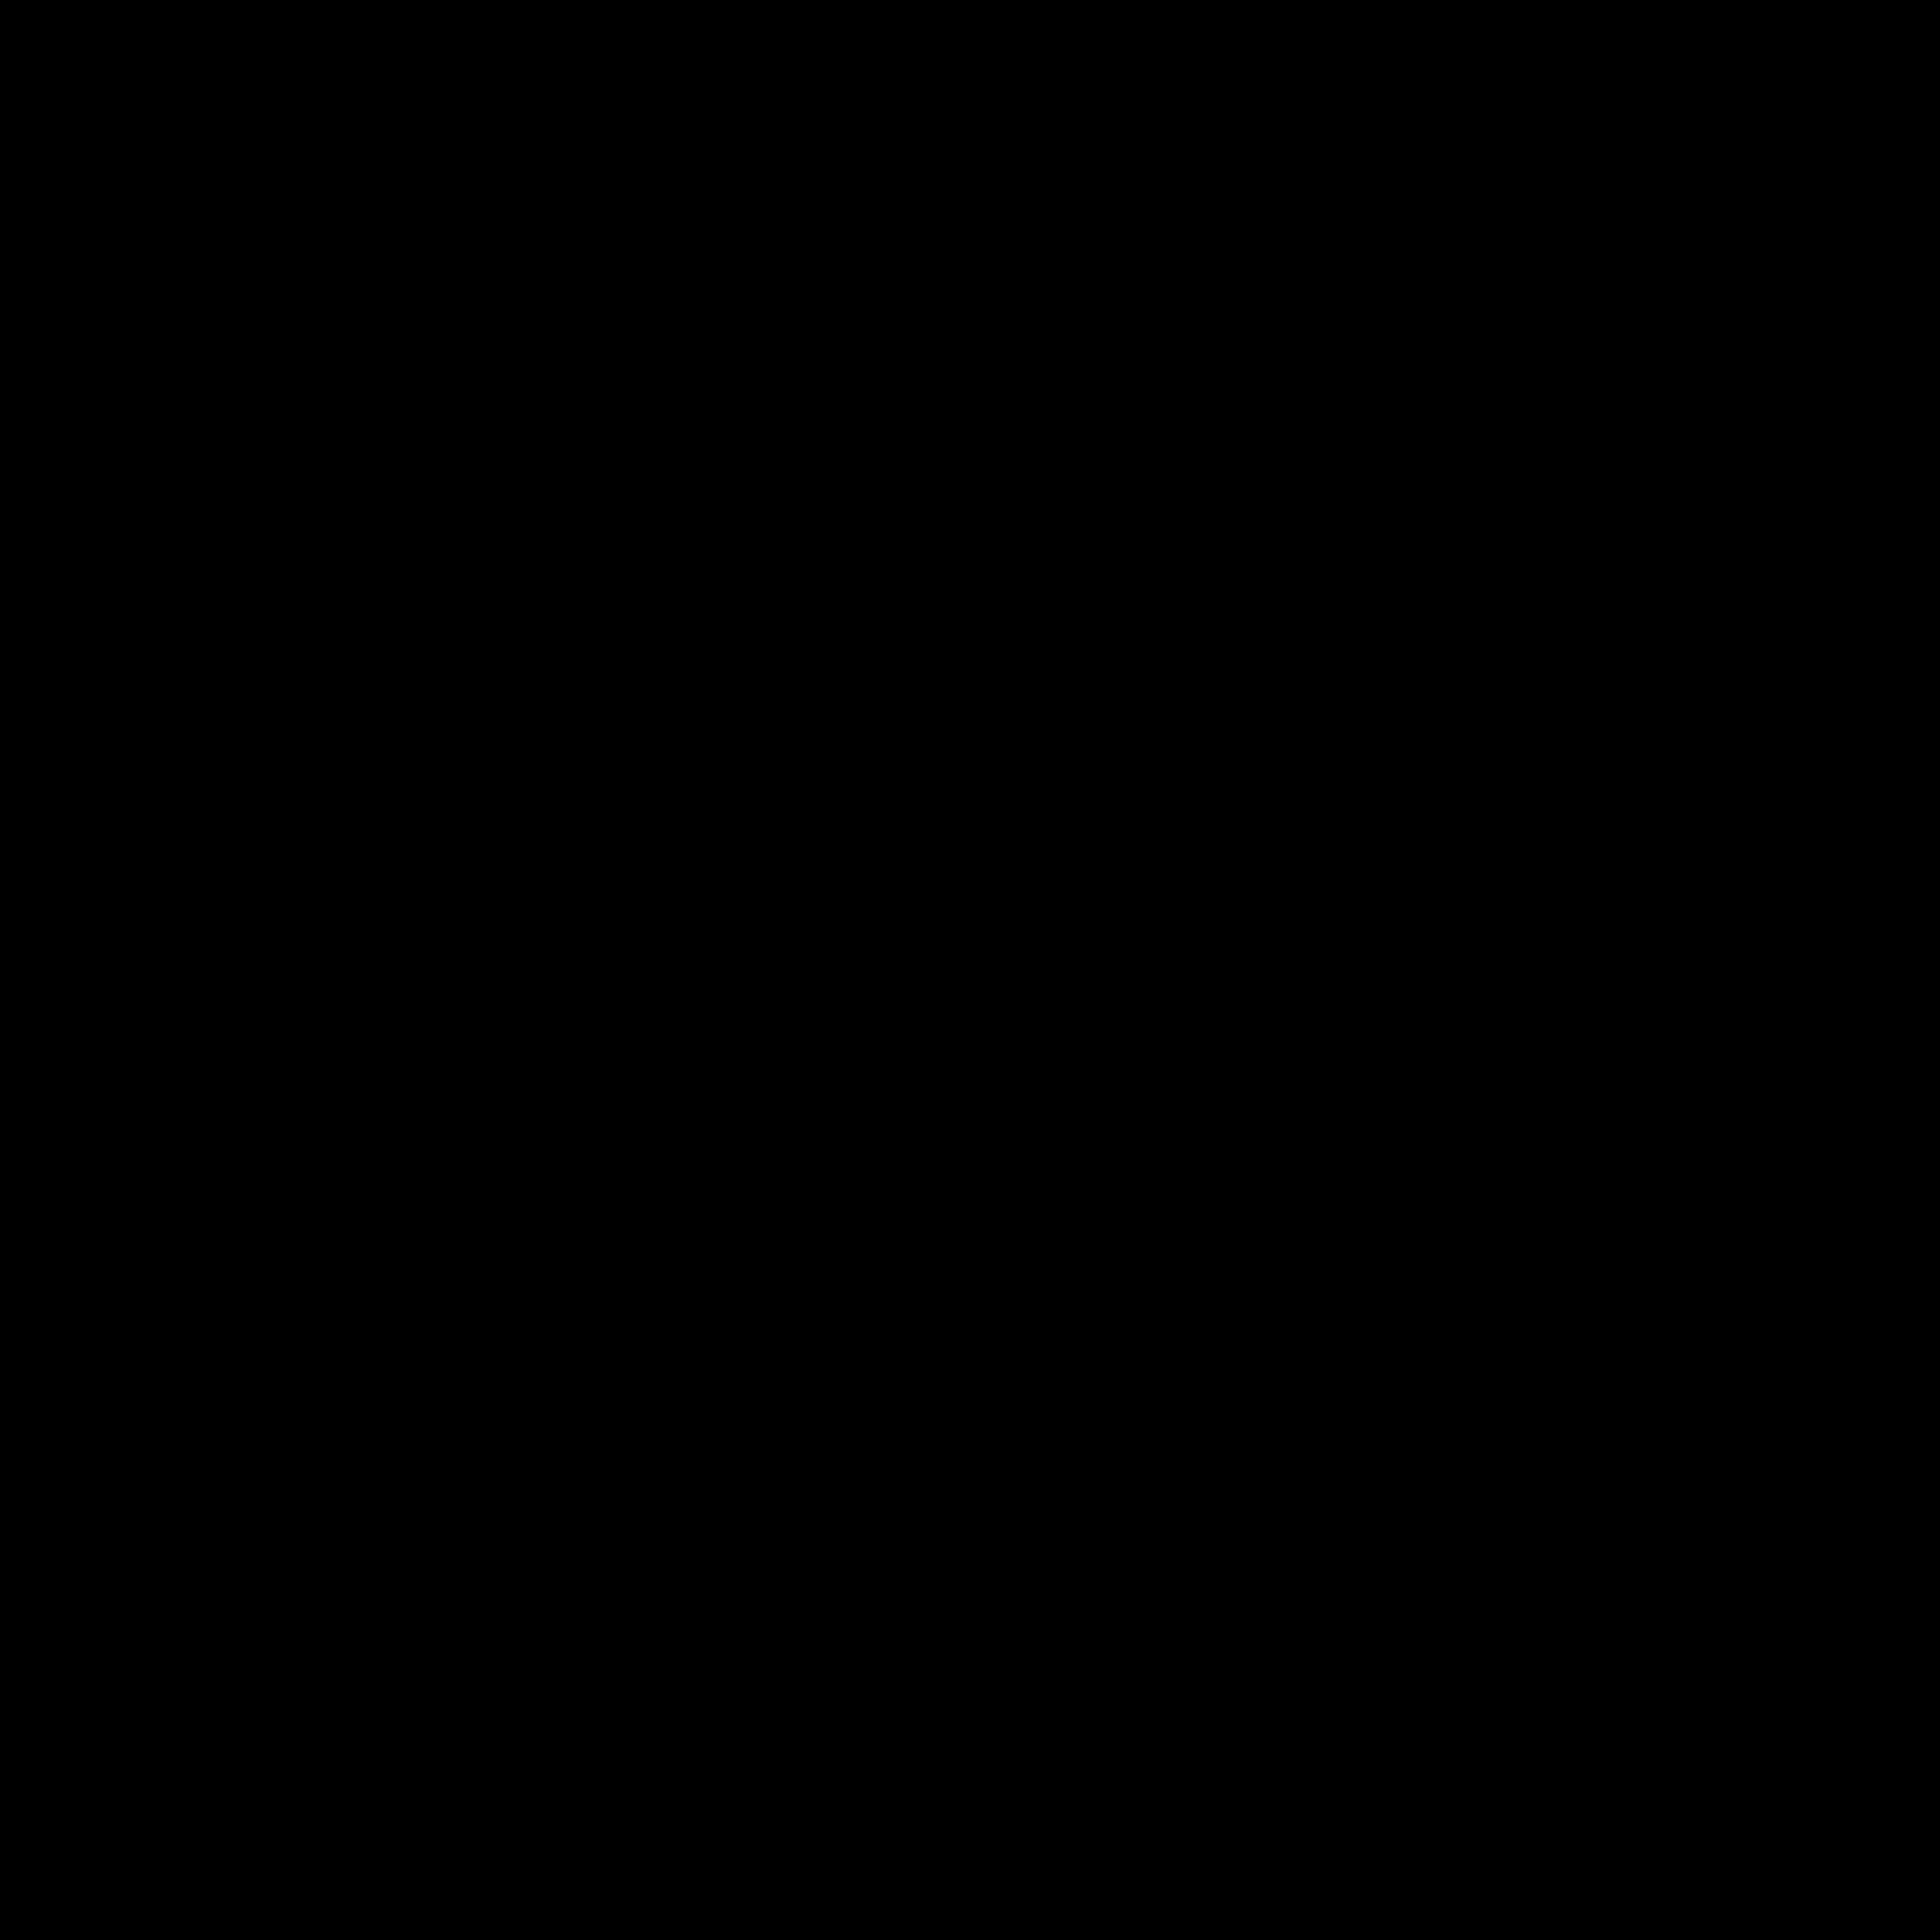 White Circle Vector